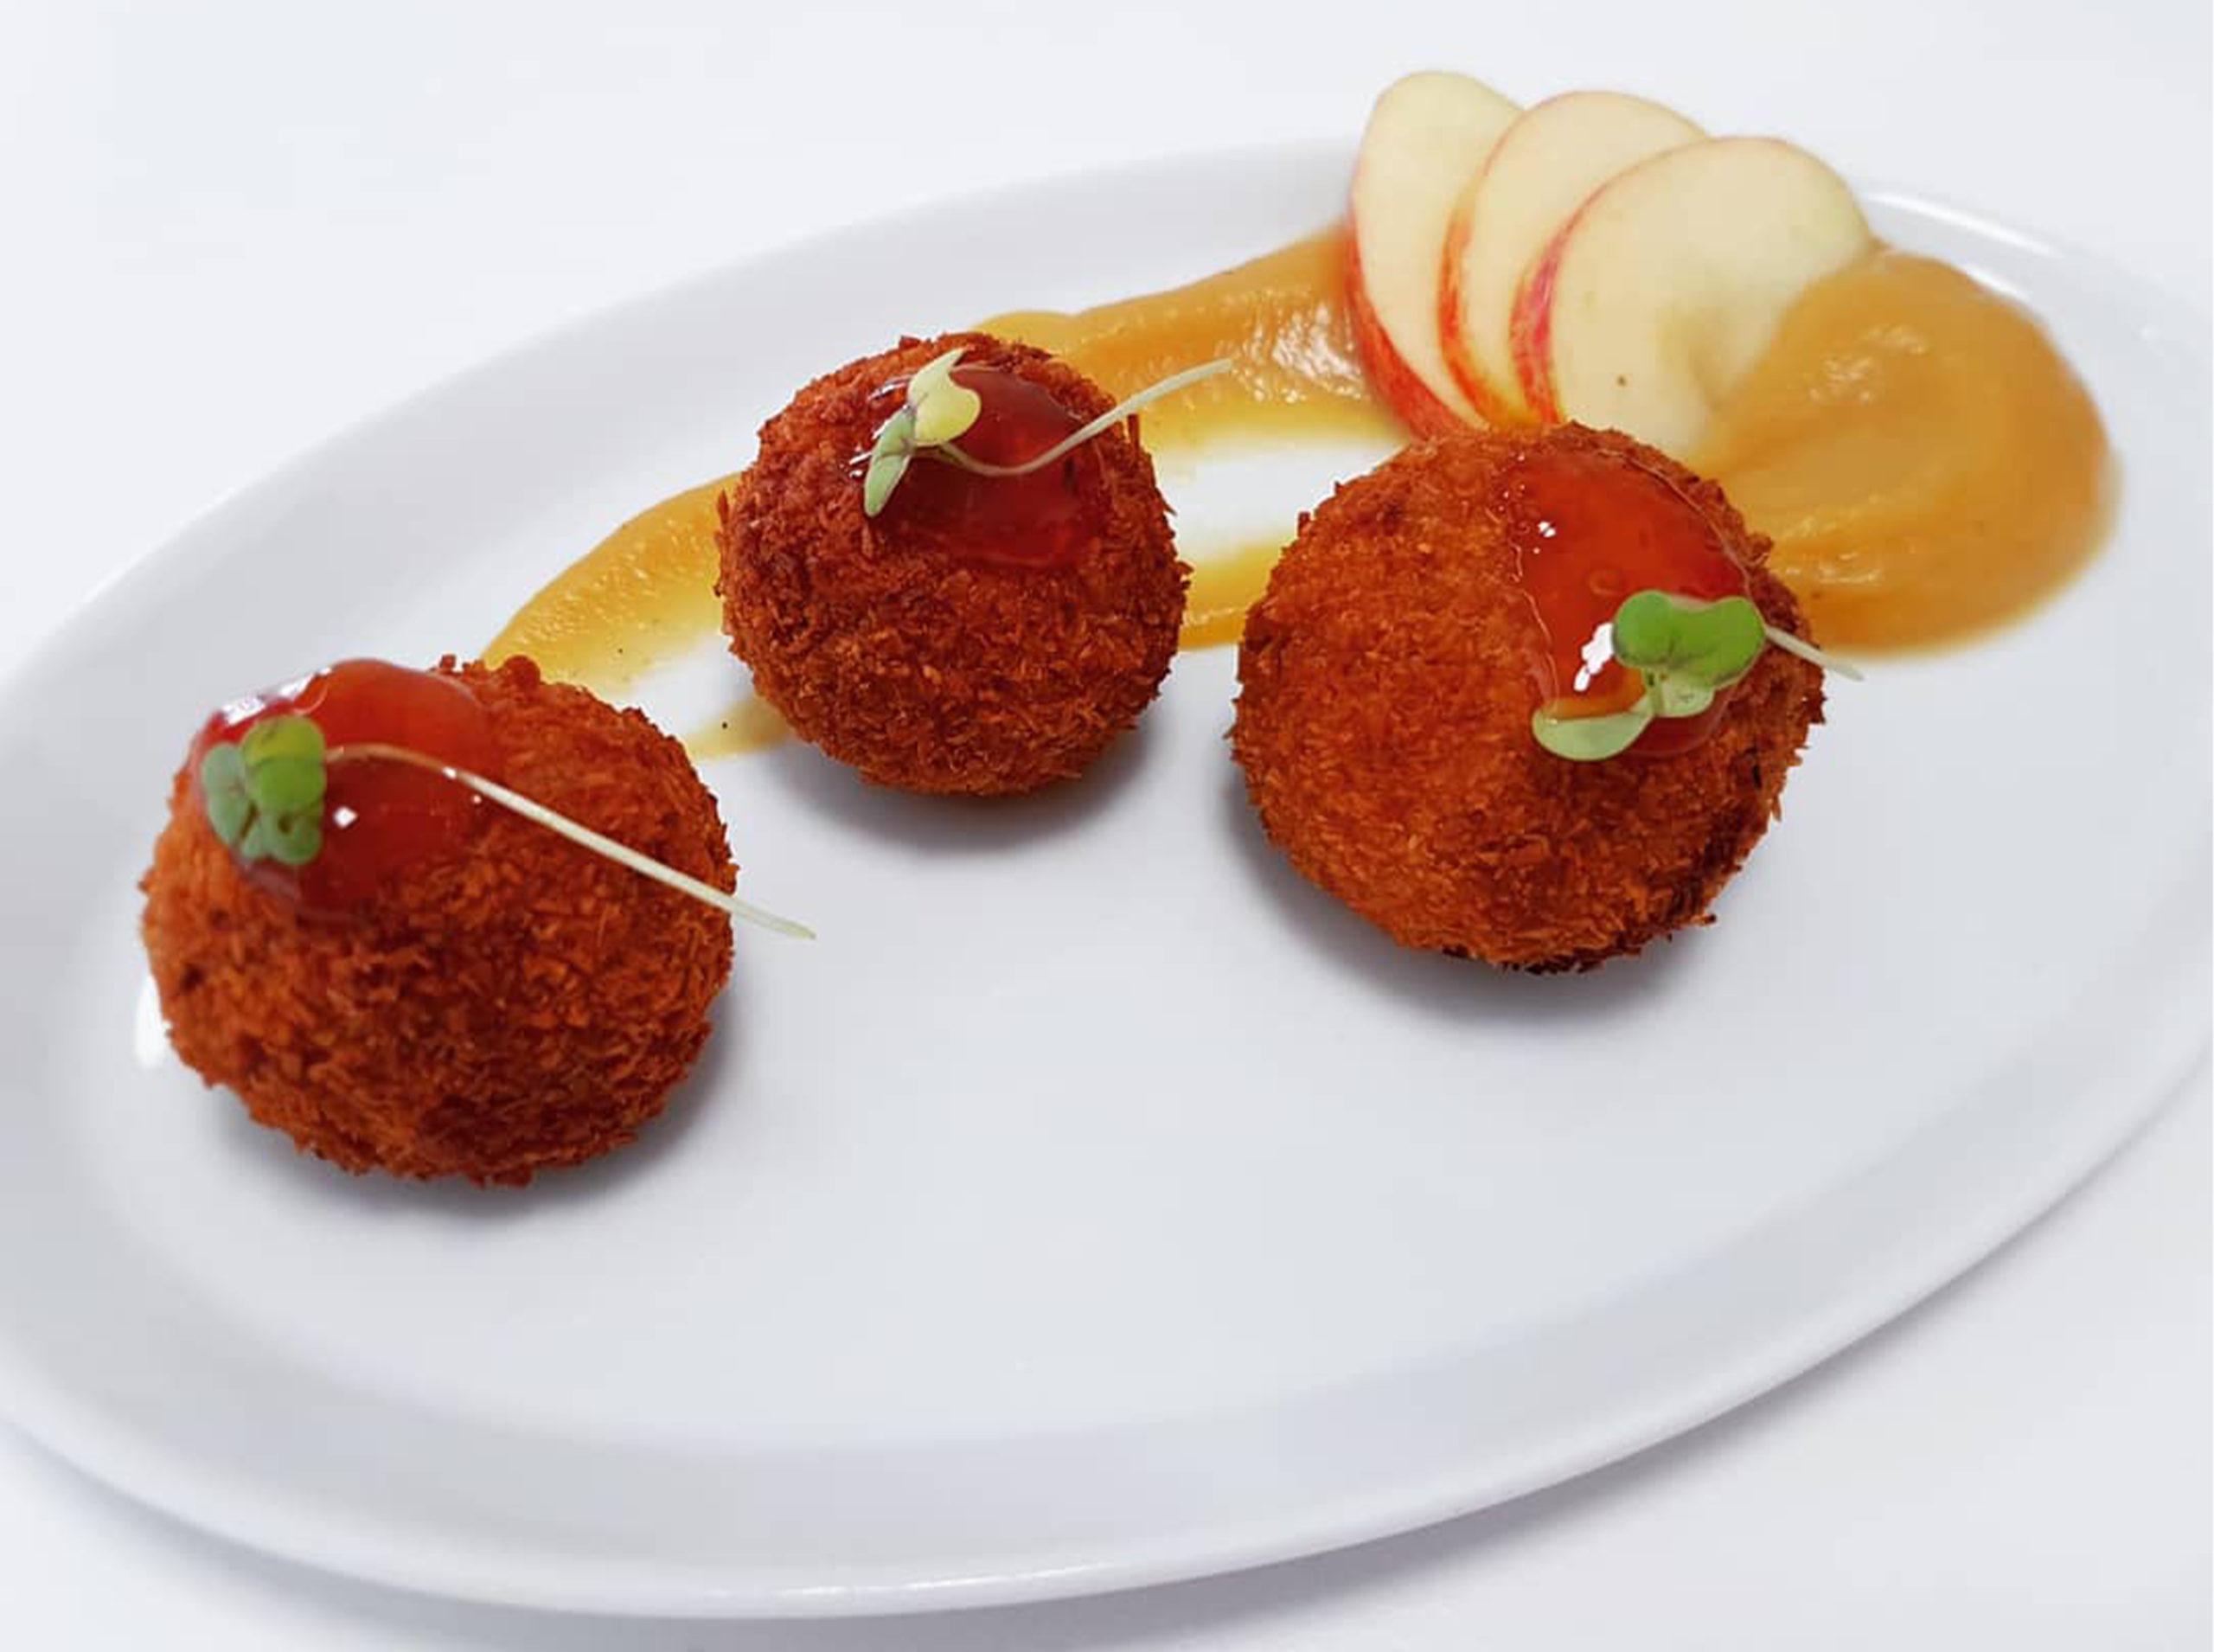 M03. Restaurante Álvaro de Campos